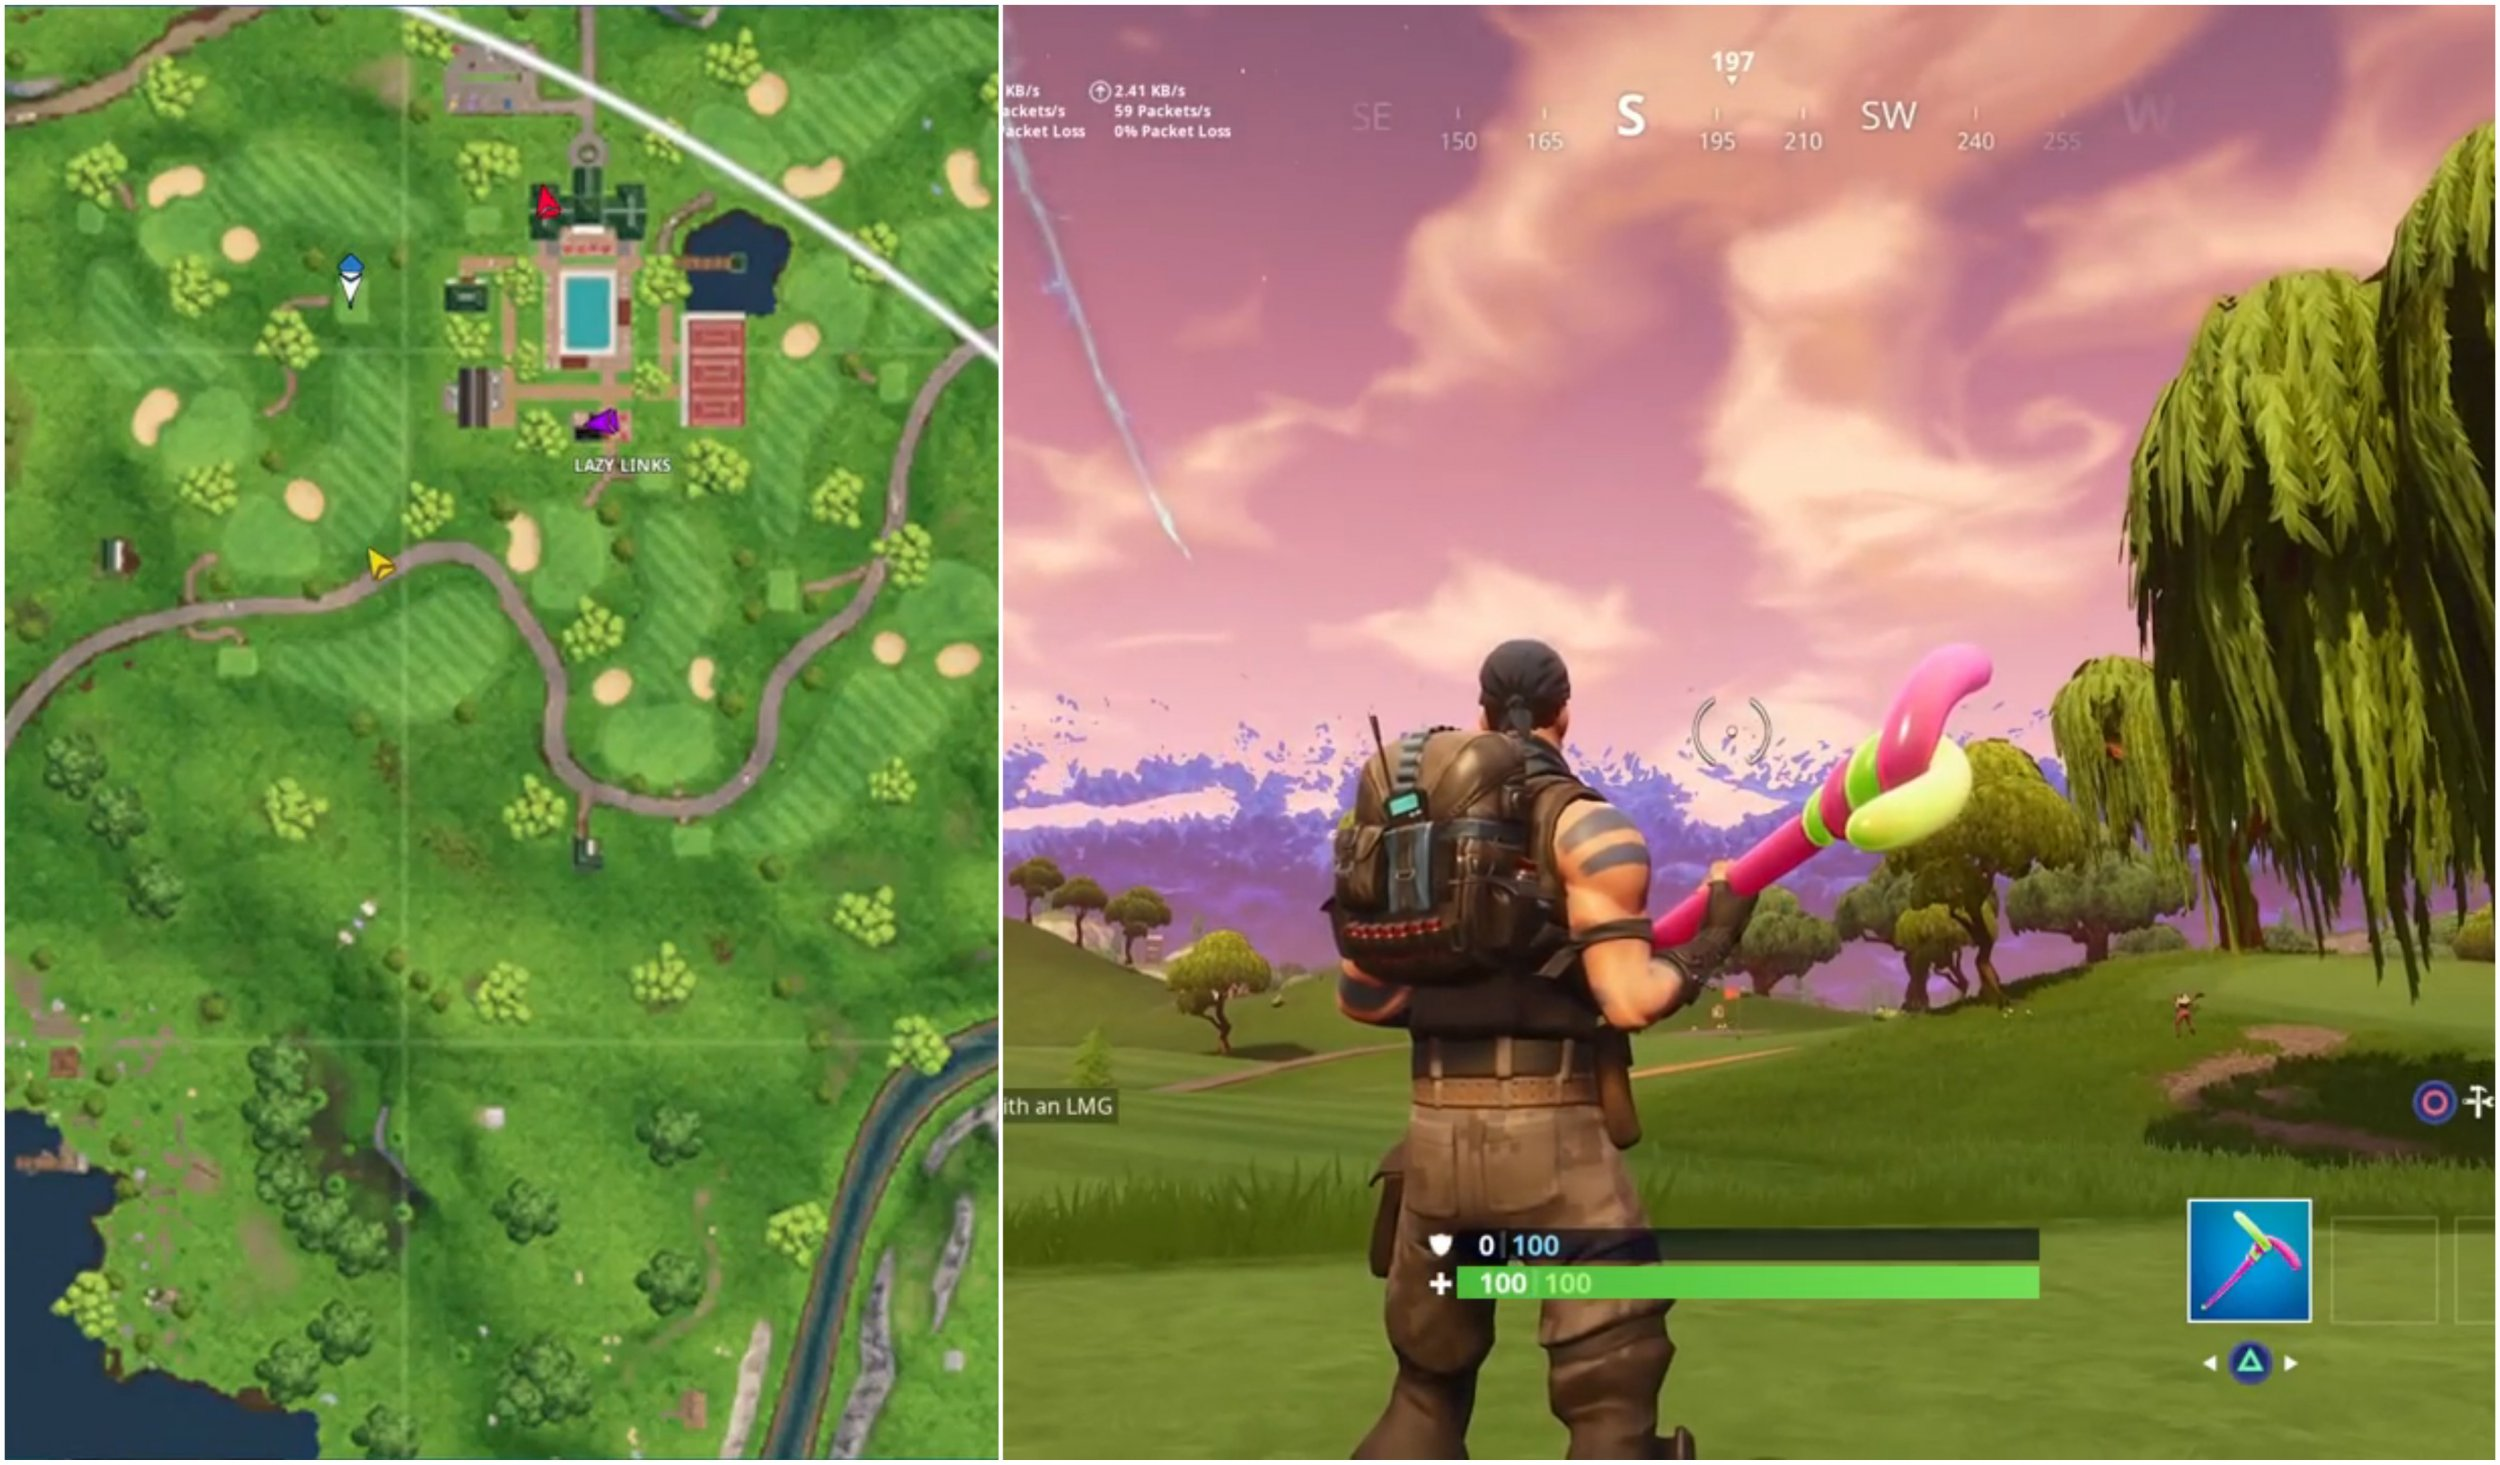 fortnite hole 3 location - fortnite golf ball